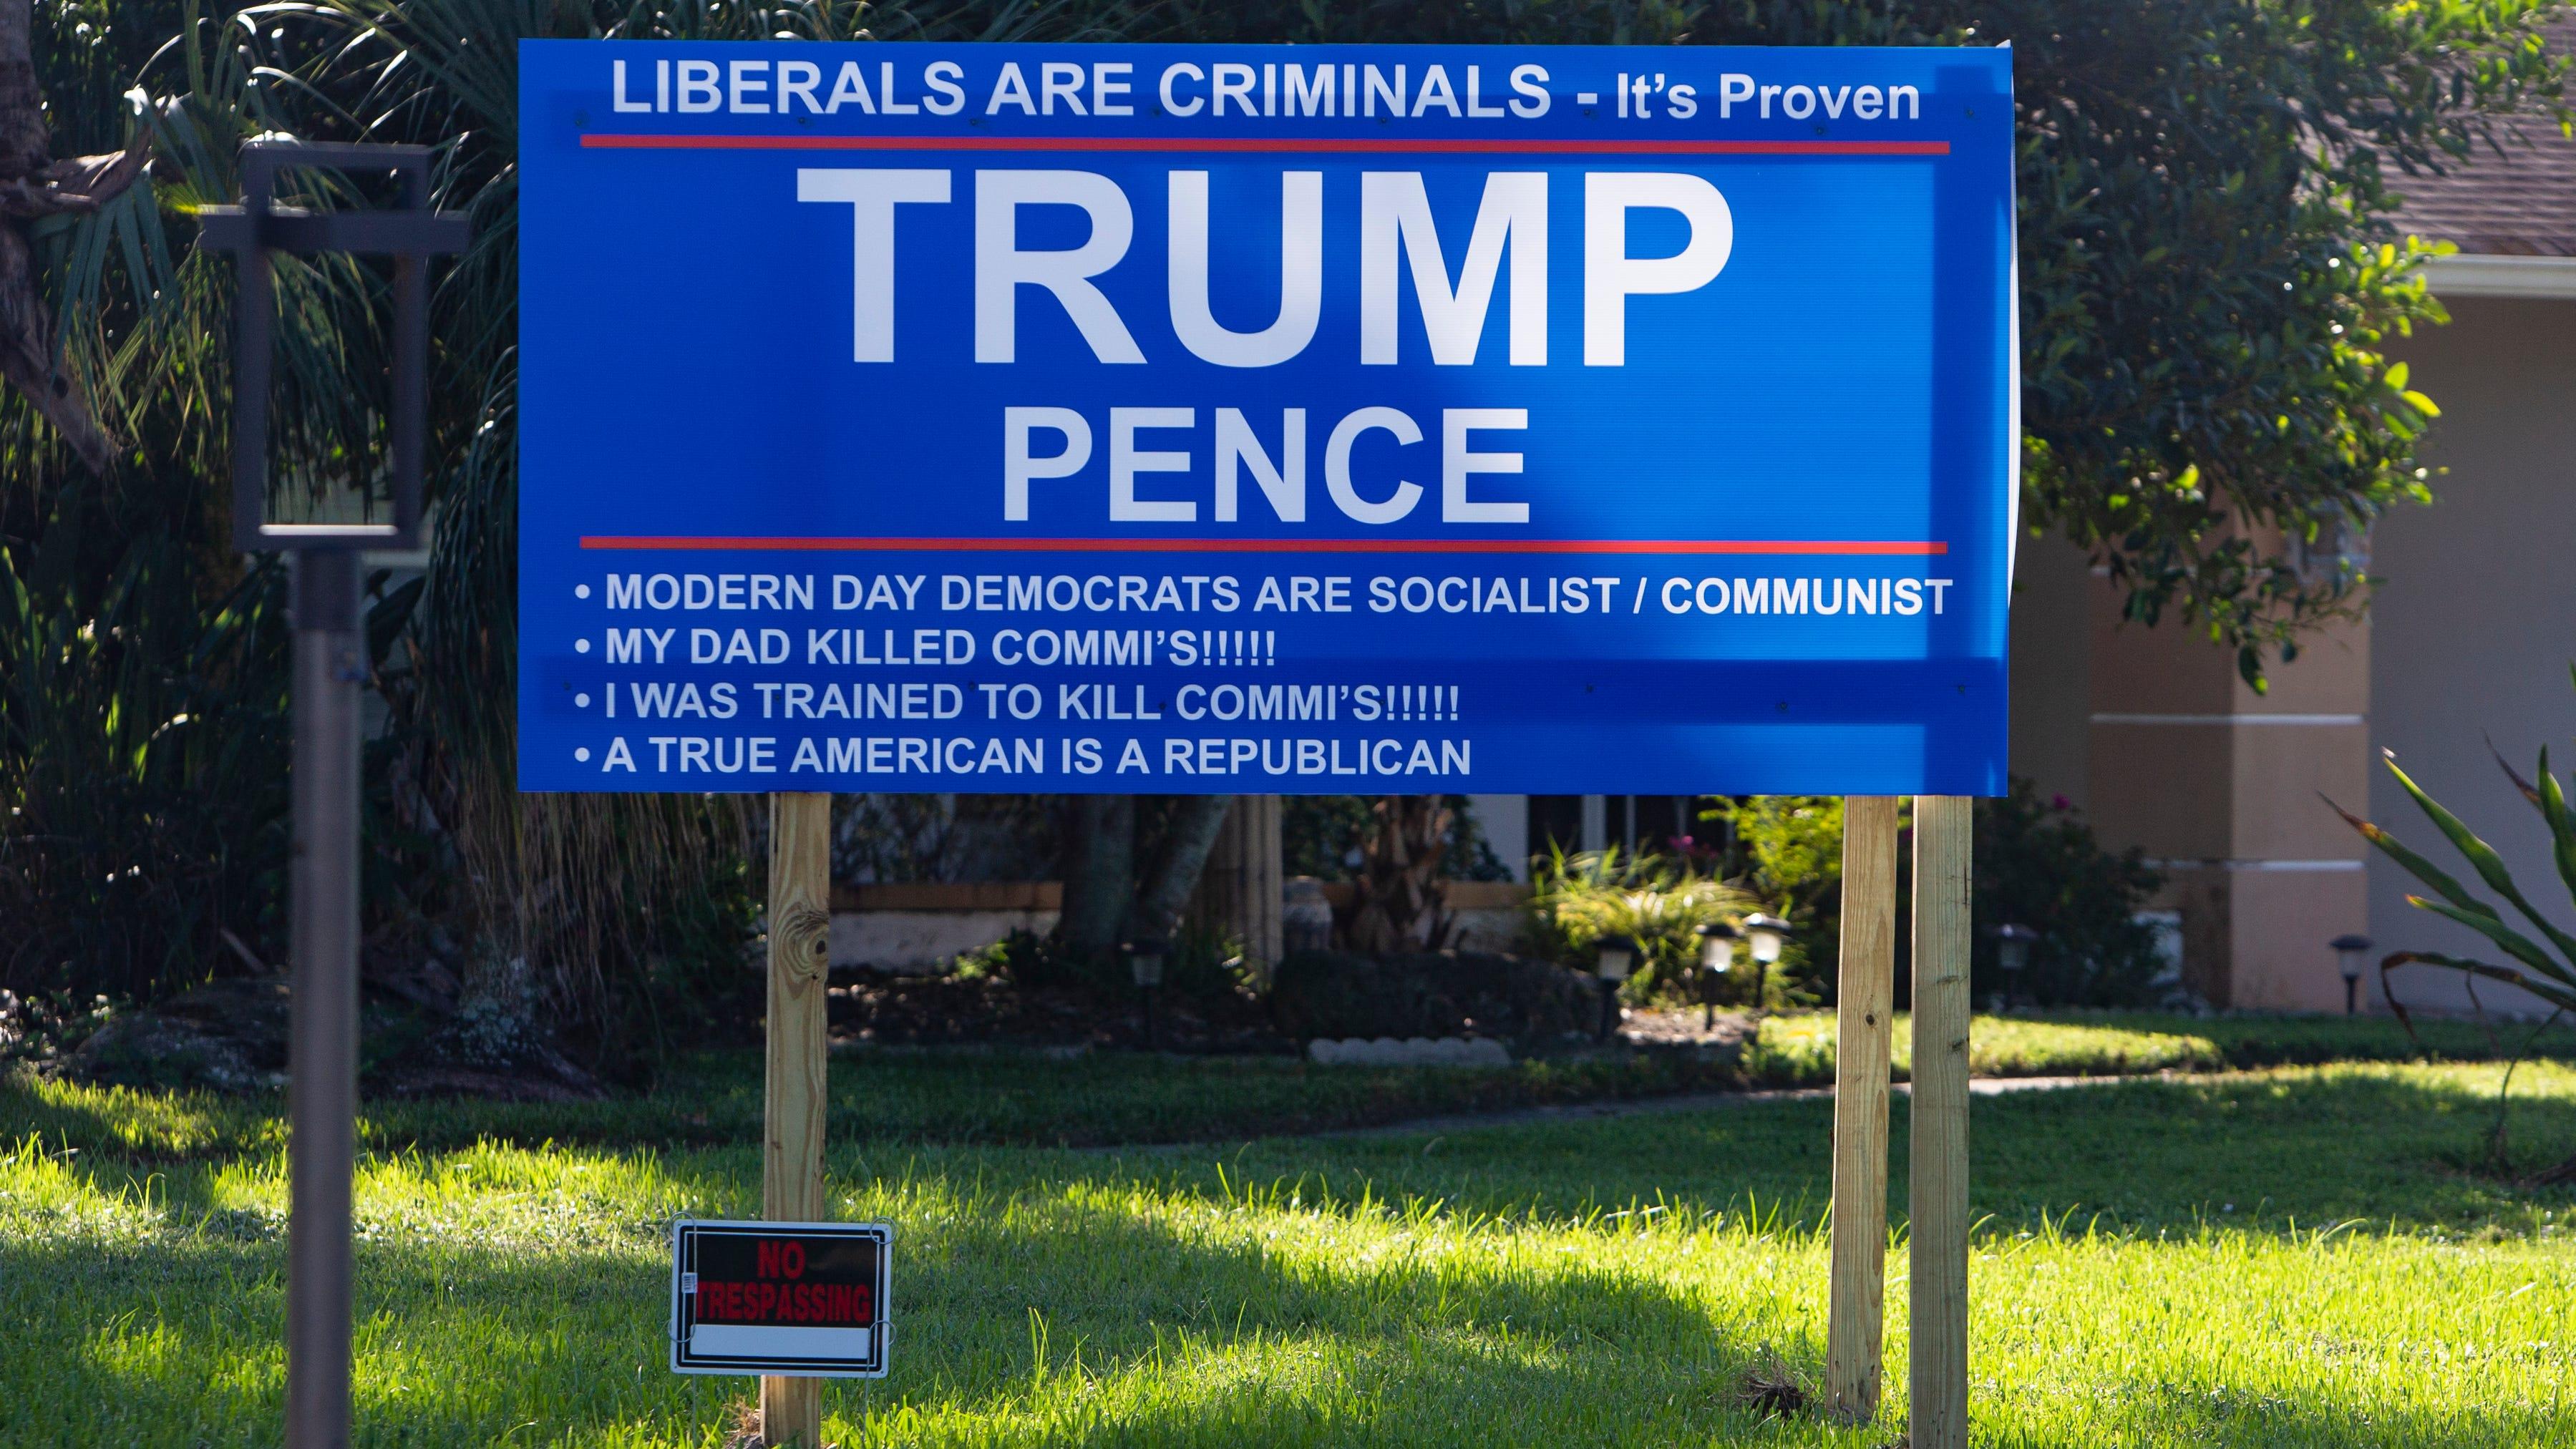 Homemade Trump campaign sign violates codes, draws complaints